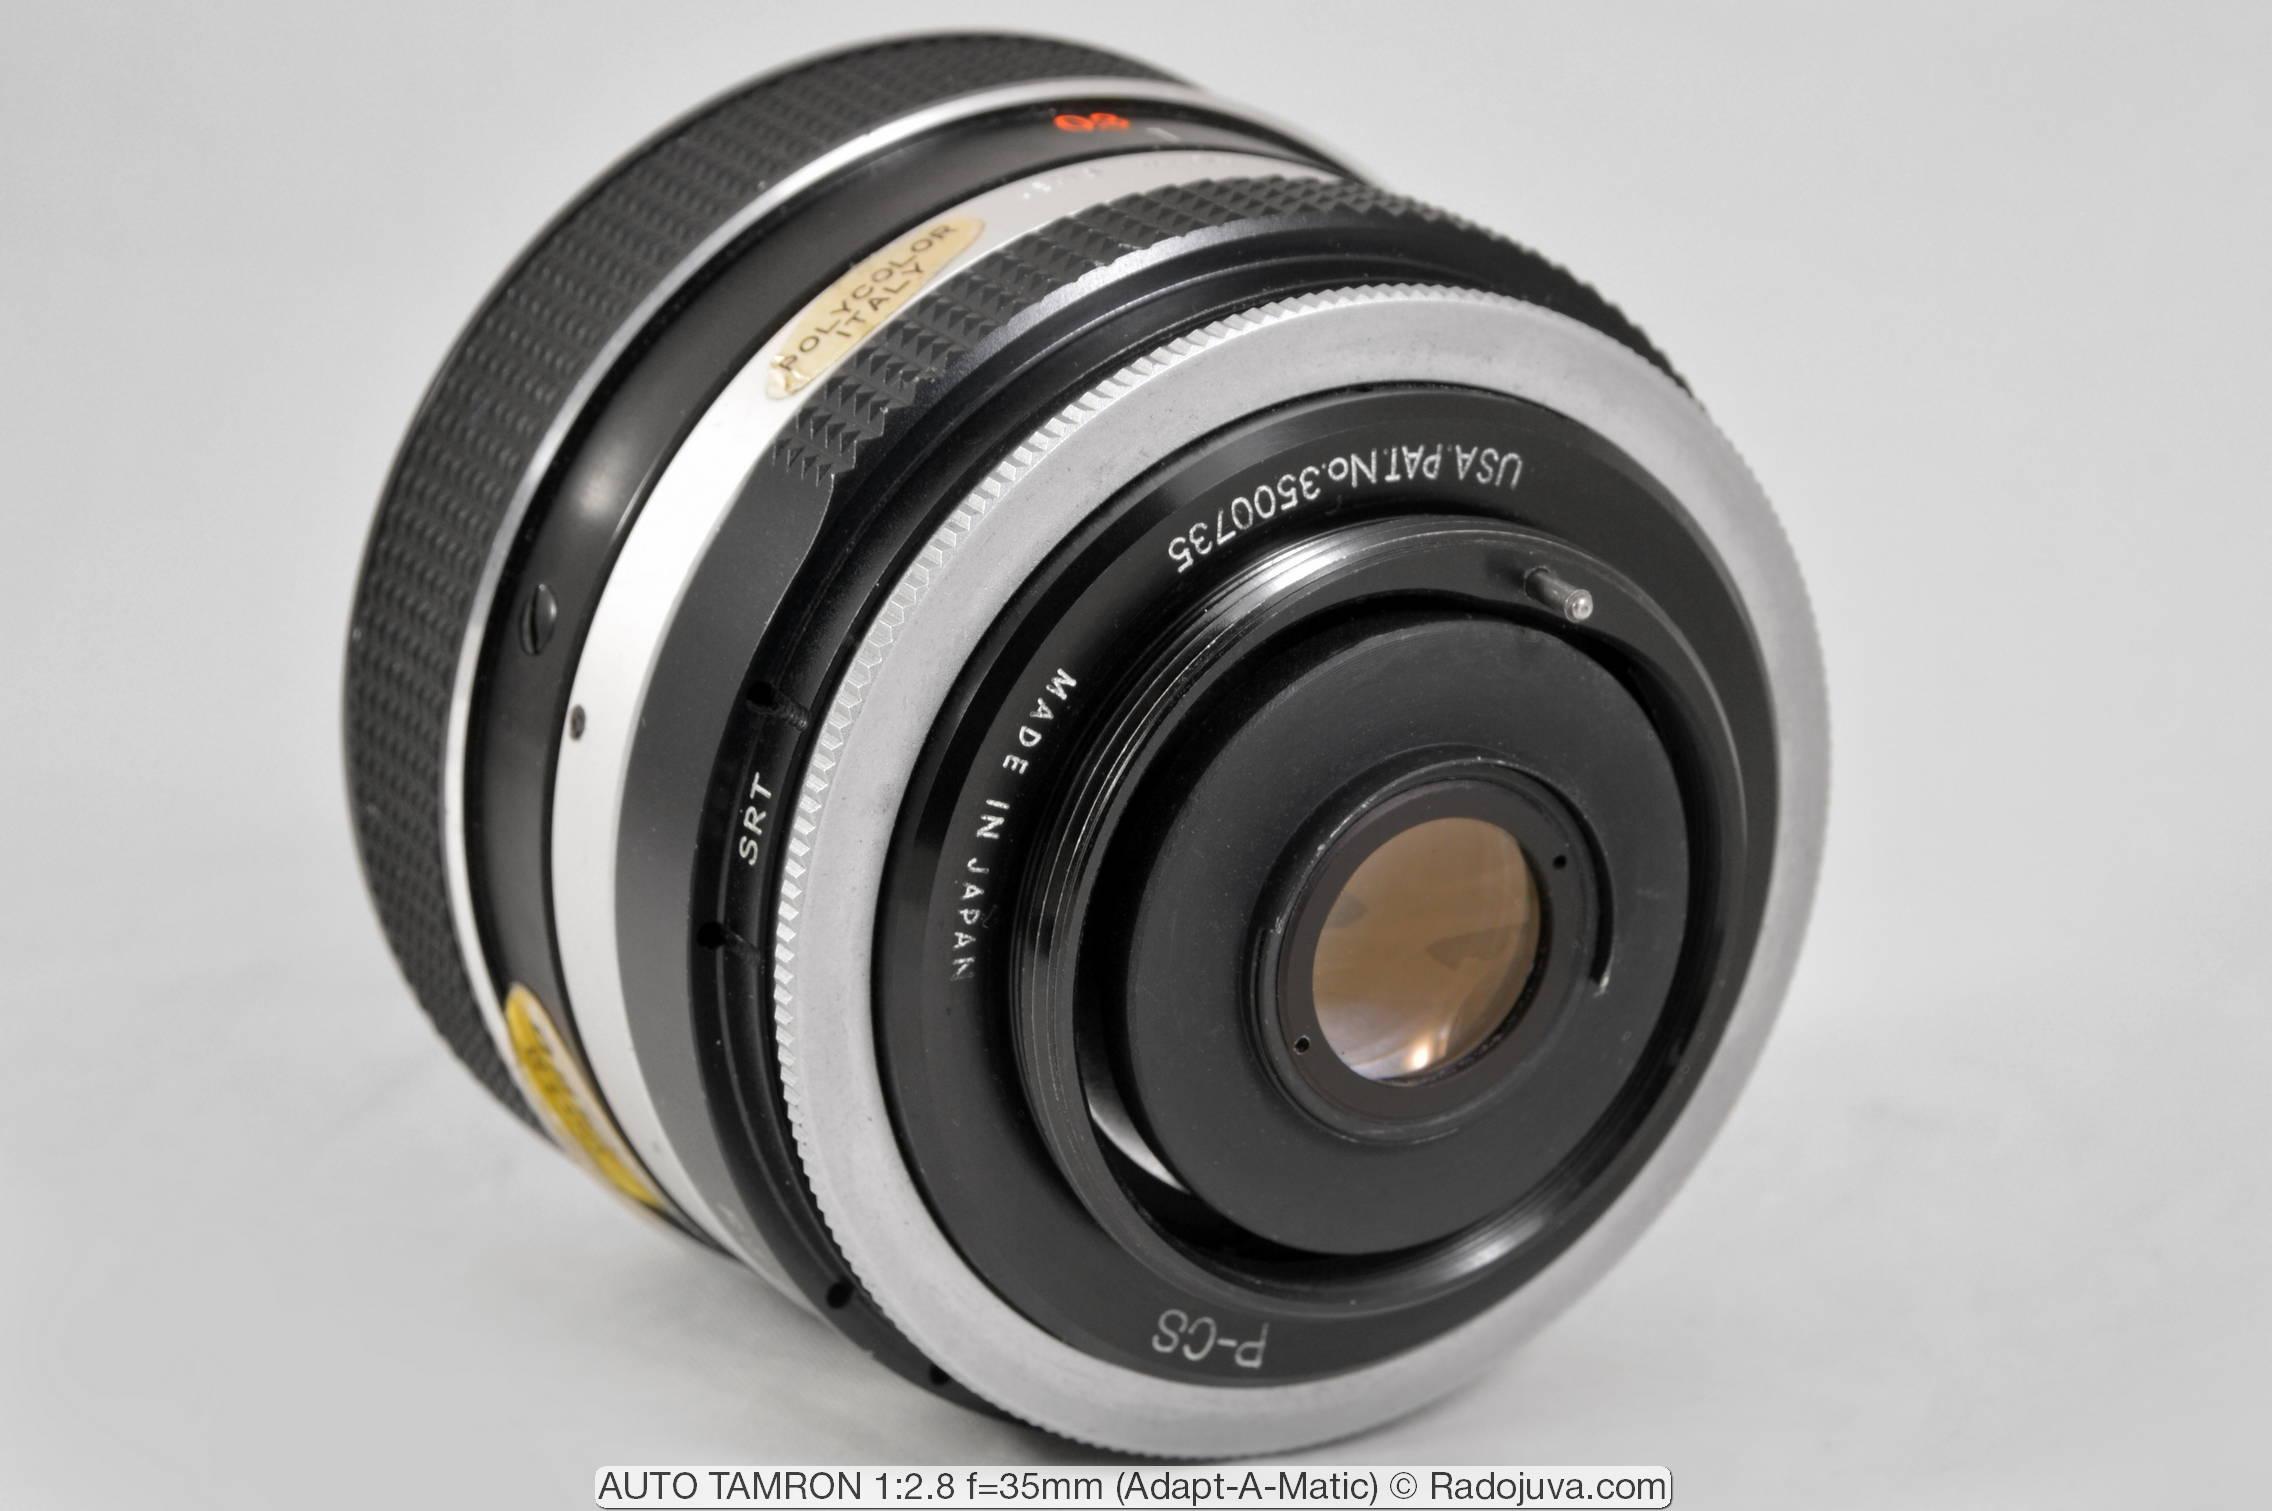 AUTO TAMRON 1:2.8 f=35mm (Adapt-A-Matic)